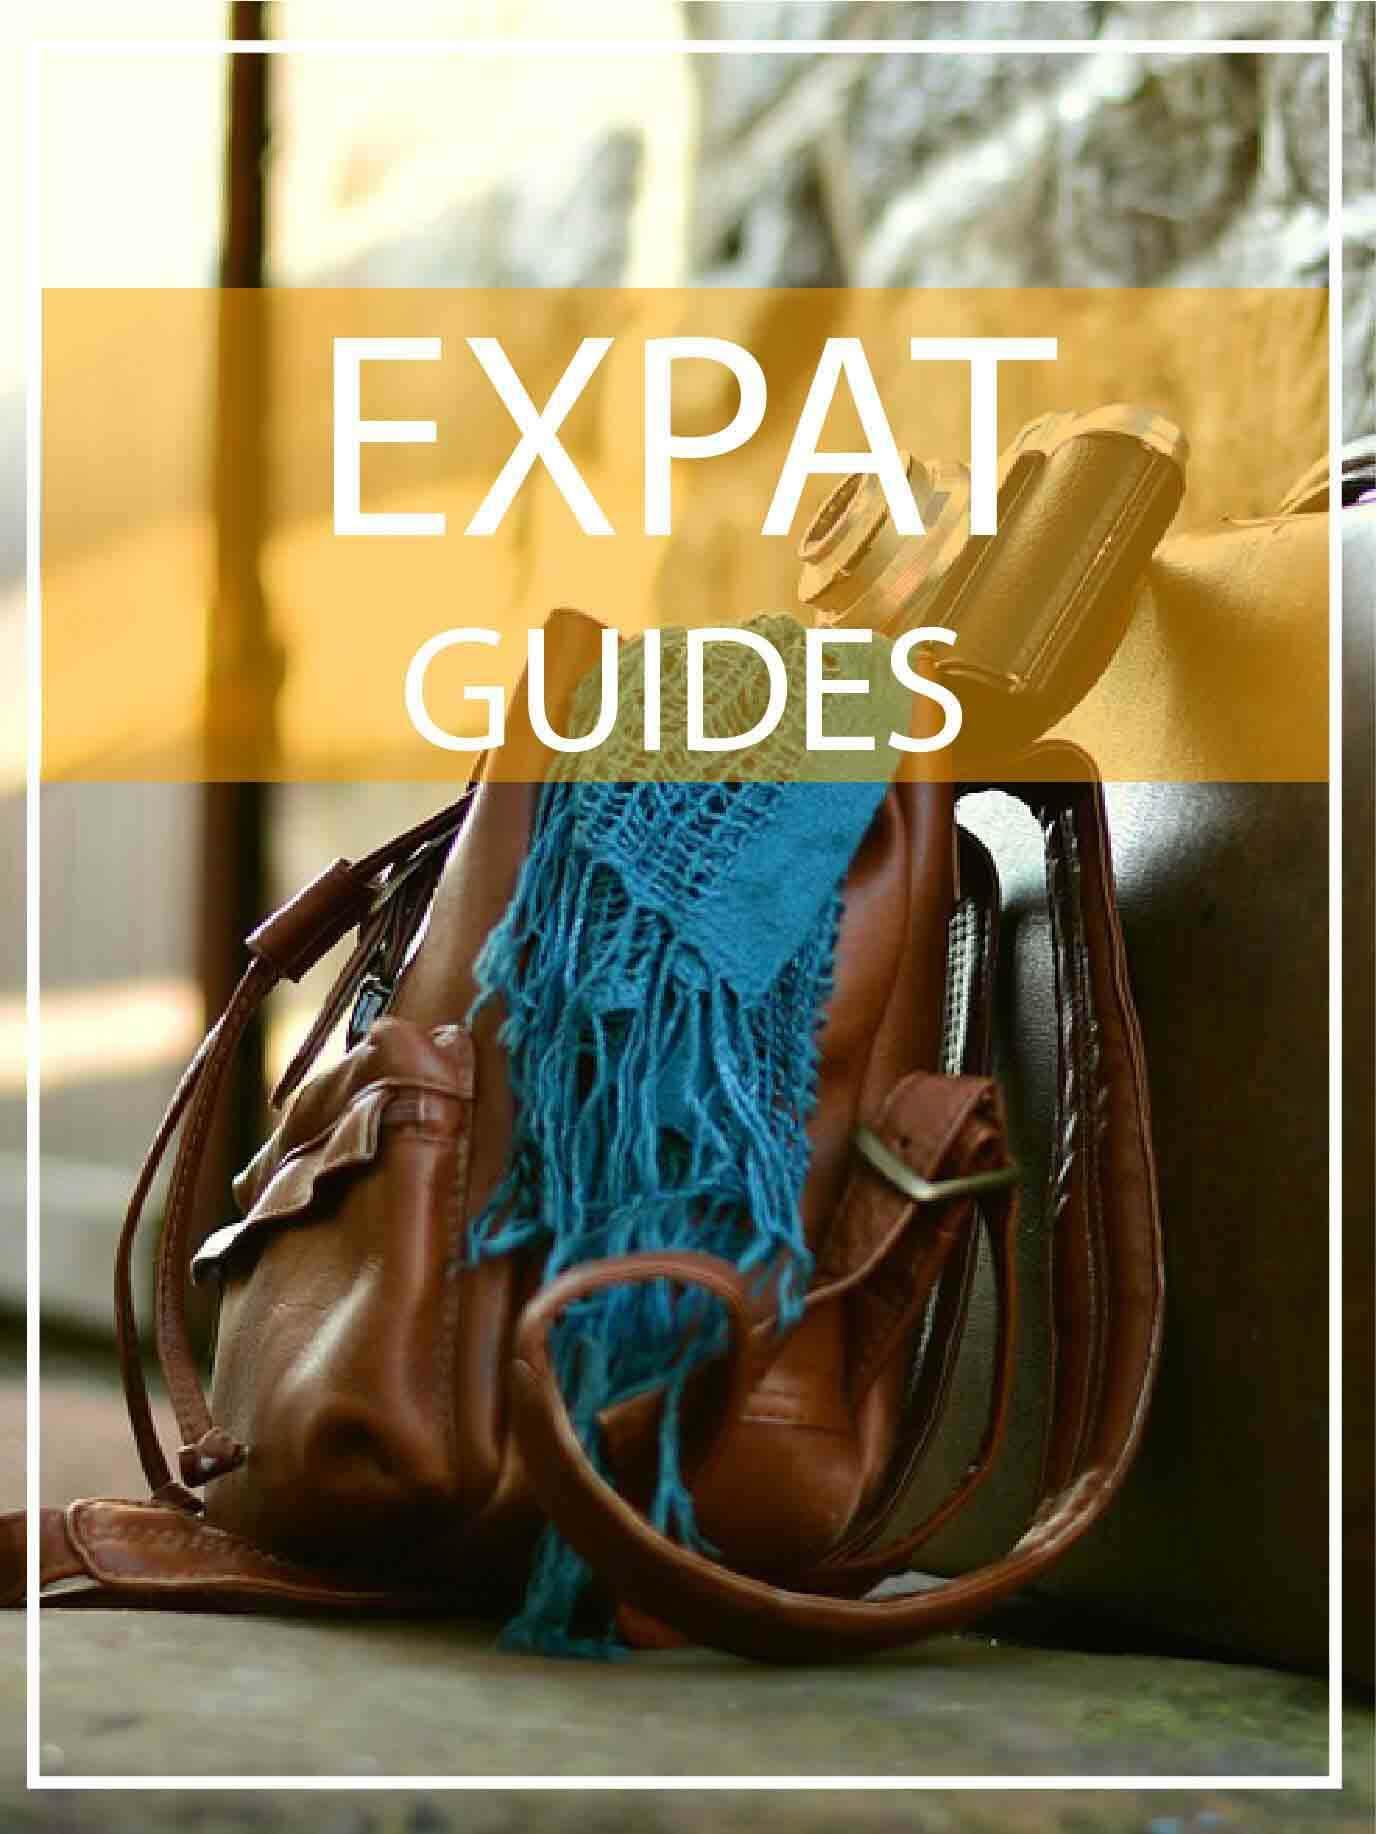 expat guides